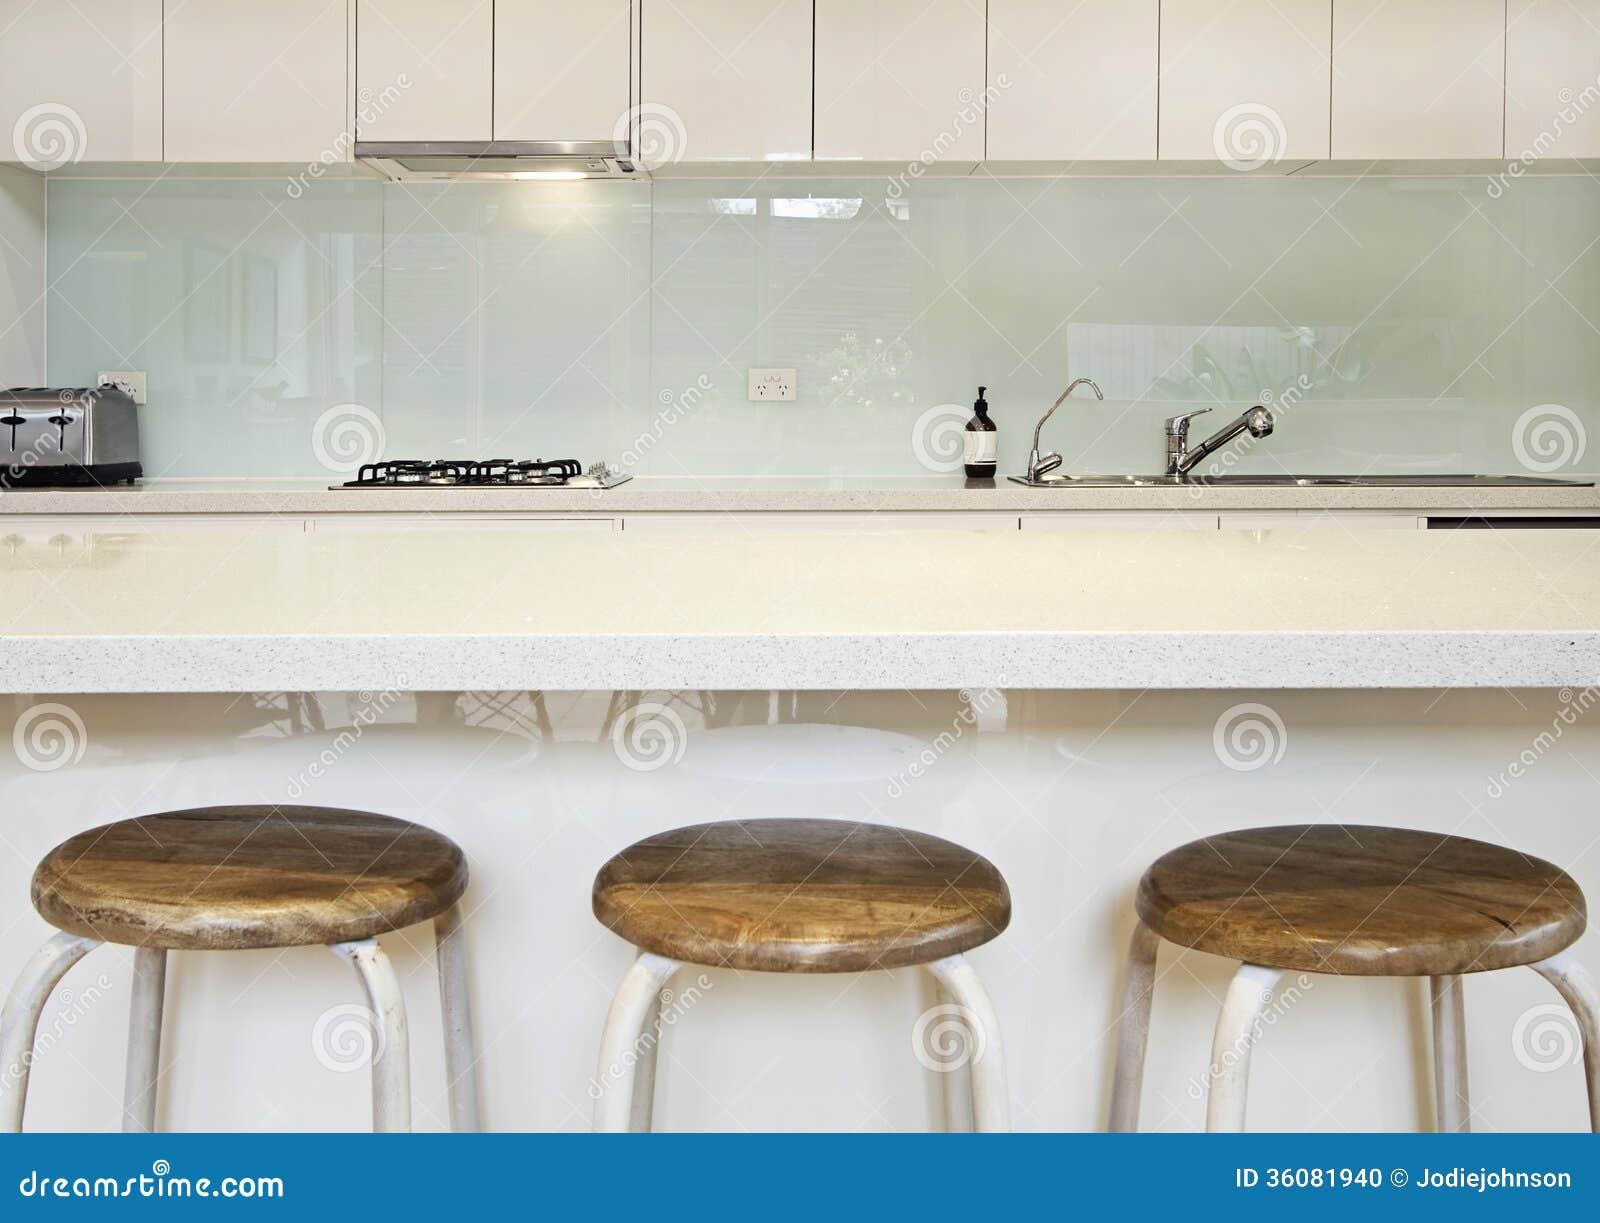 Kitchen benchtop, splashback and stools contemporary.